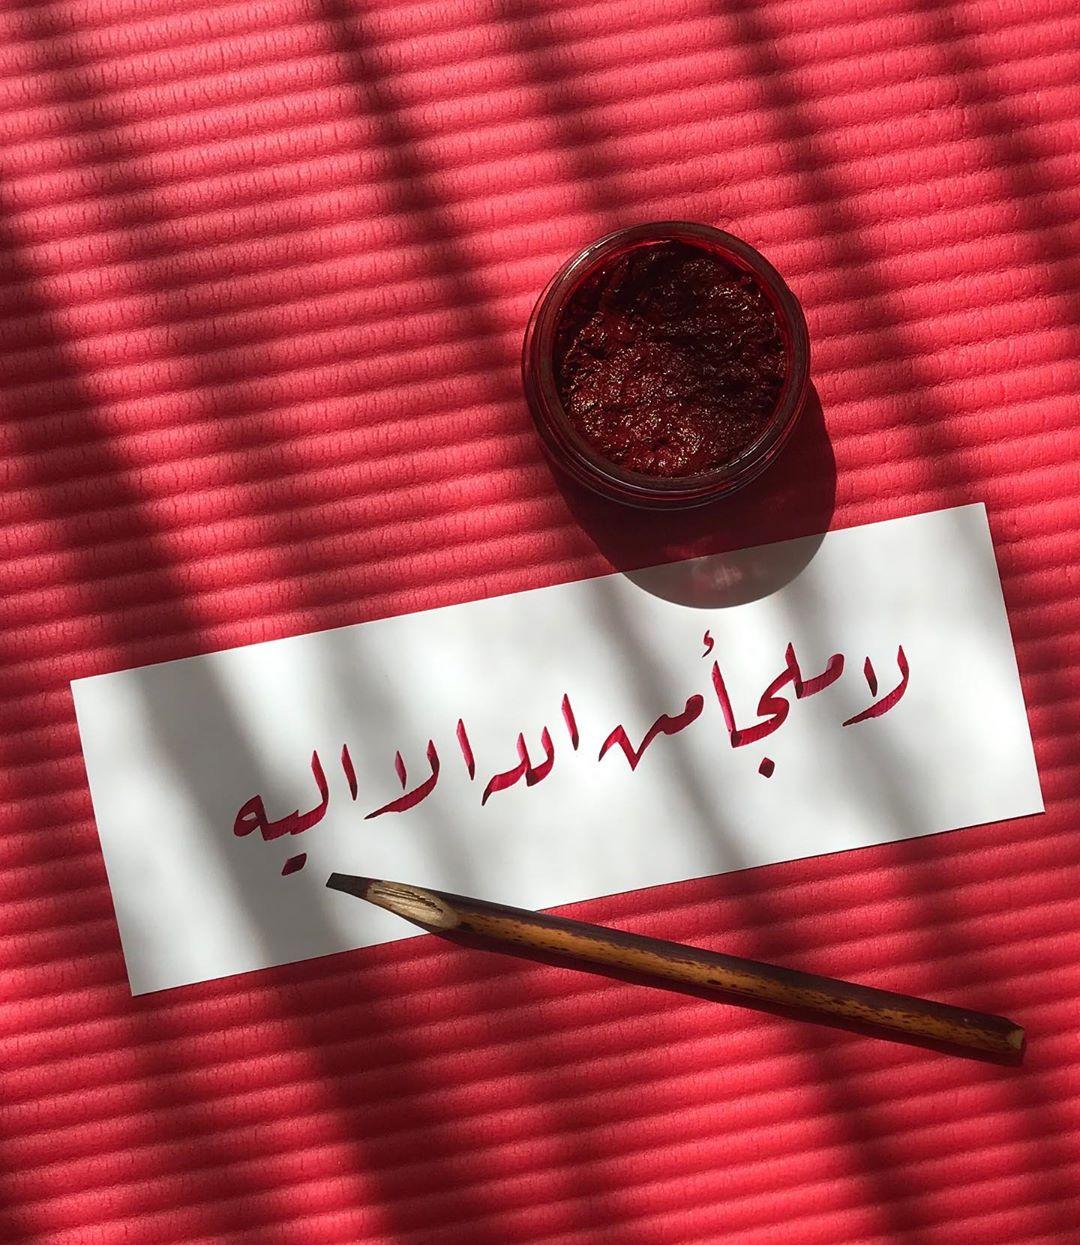 Donwload Photo Tevbe-118 سورة التوبة #arabiccalligraphy #islamiccalligraphy #tezhip #hüsnühat...- hattat_aa 2